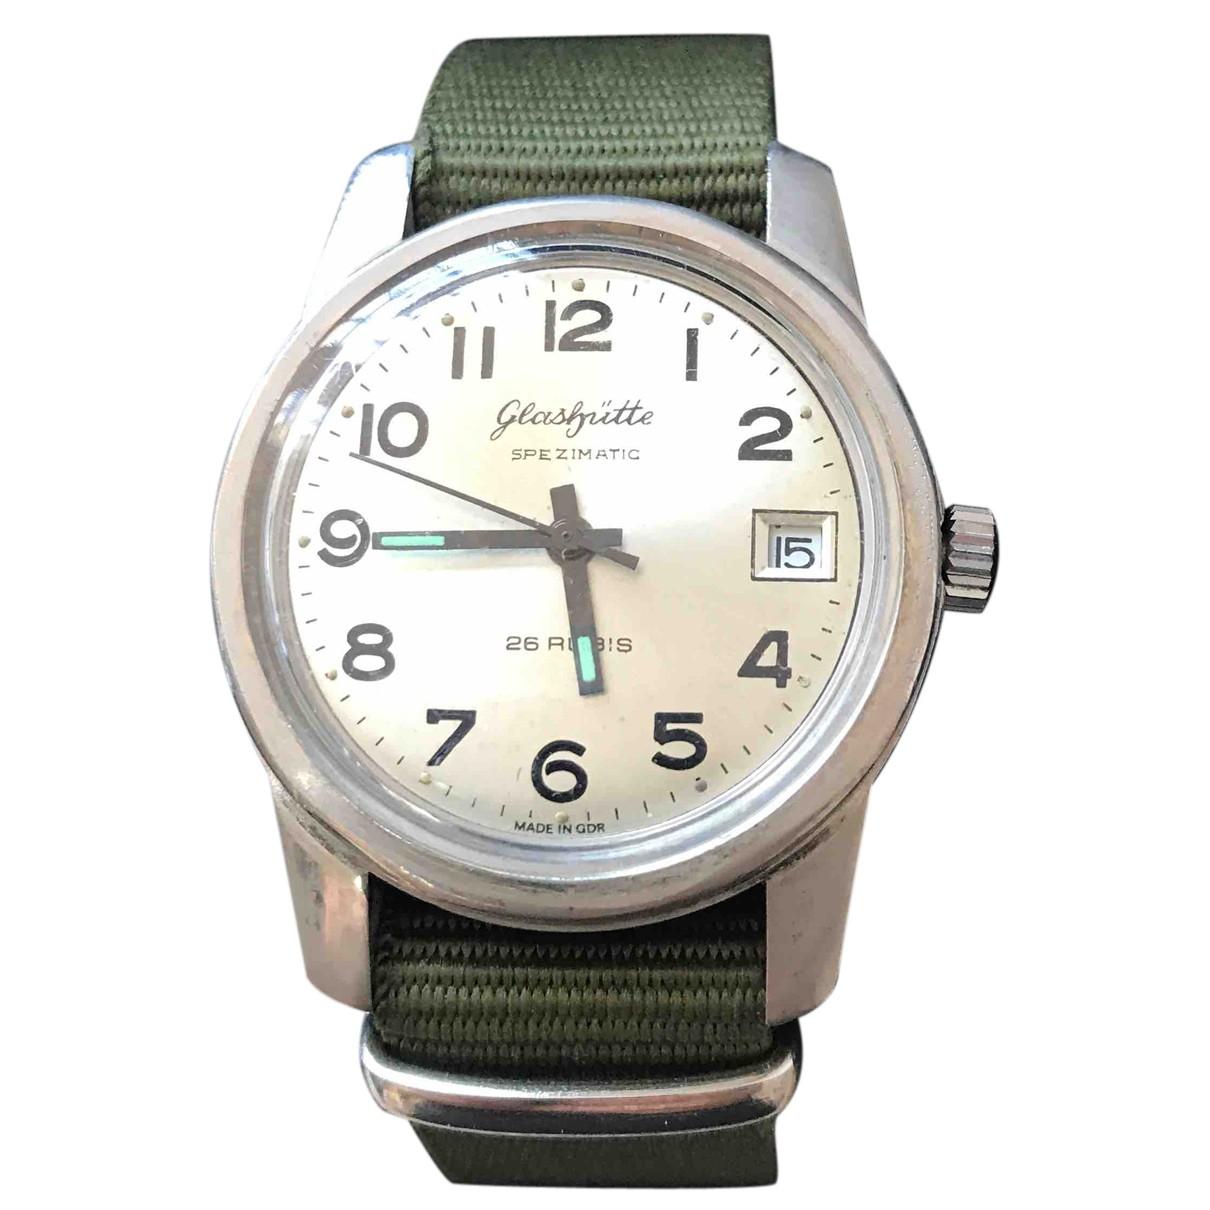 Relojes Glashutte